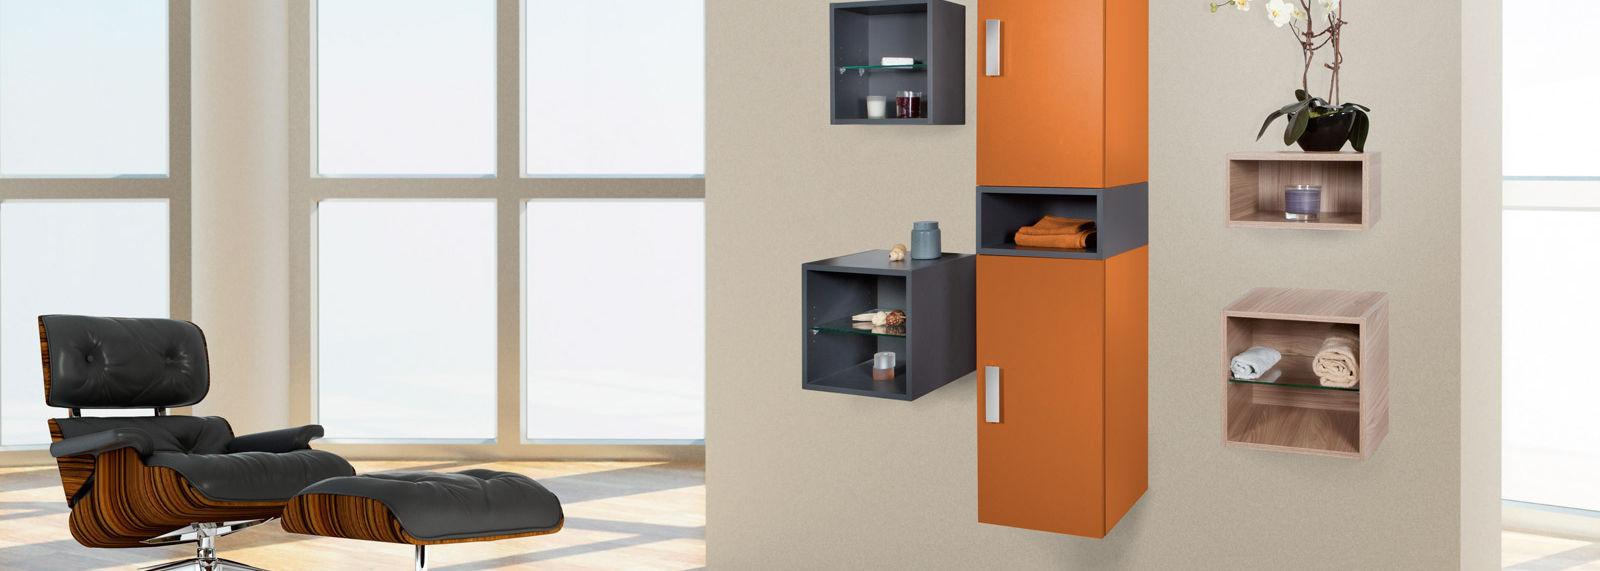 Wandmontiertes Regal / modern / Holz / für Badezimmer - FLEXI - FRAMO